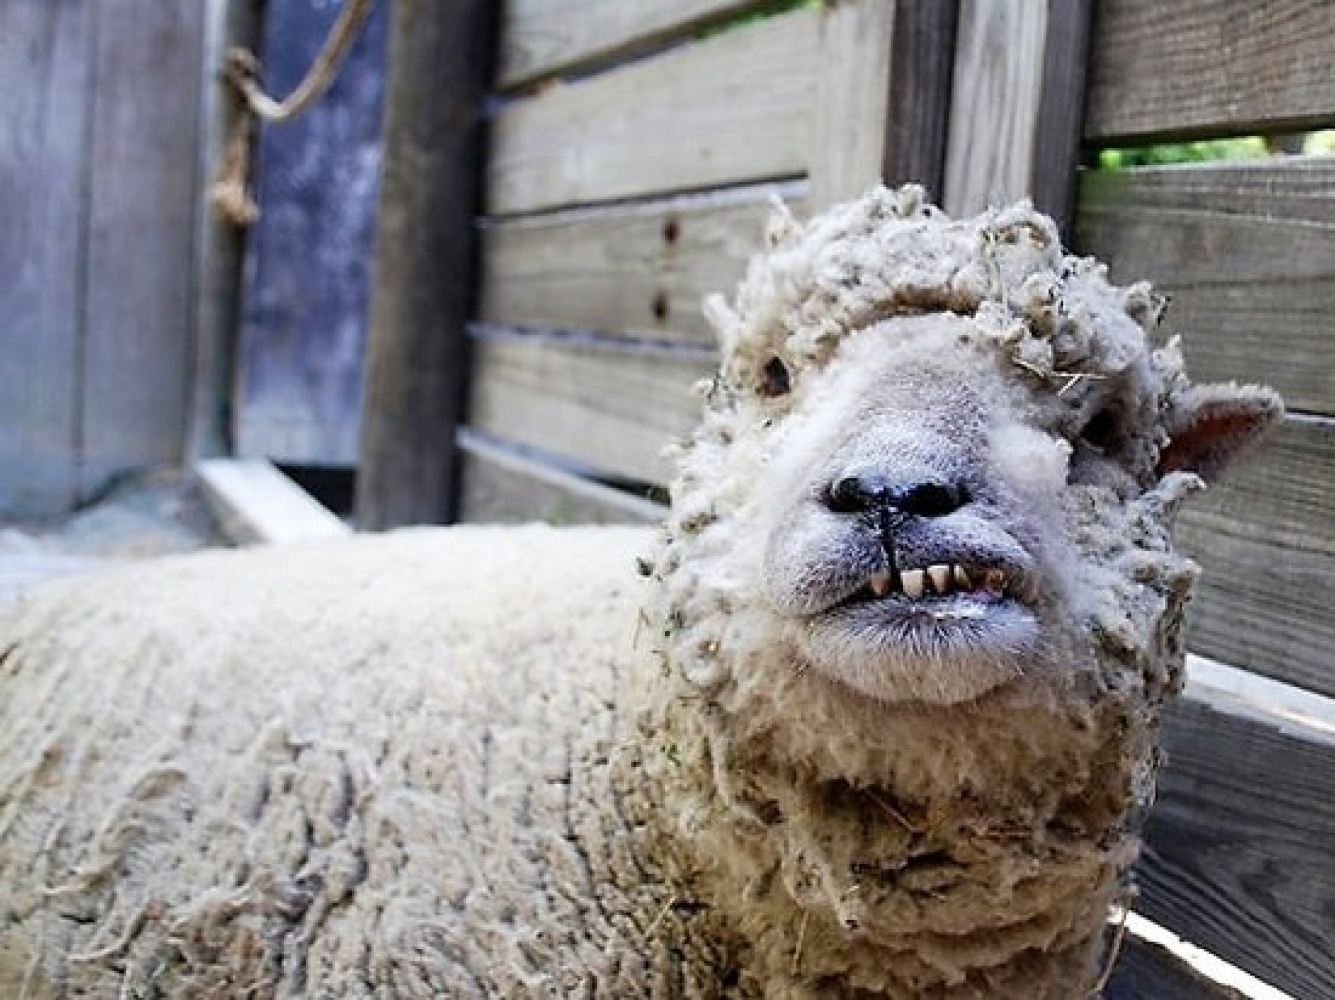 Овца смешные картинки, трех фото картинки